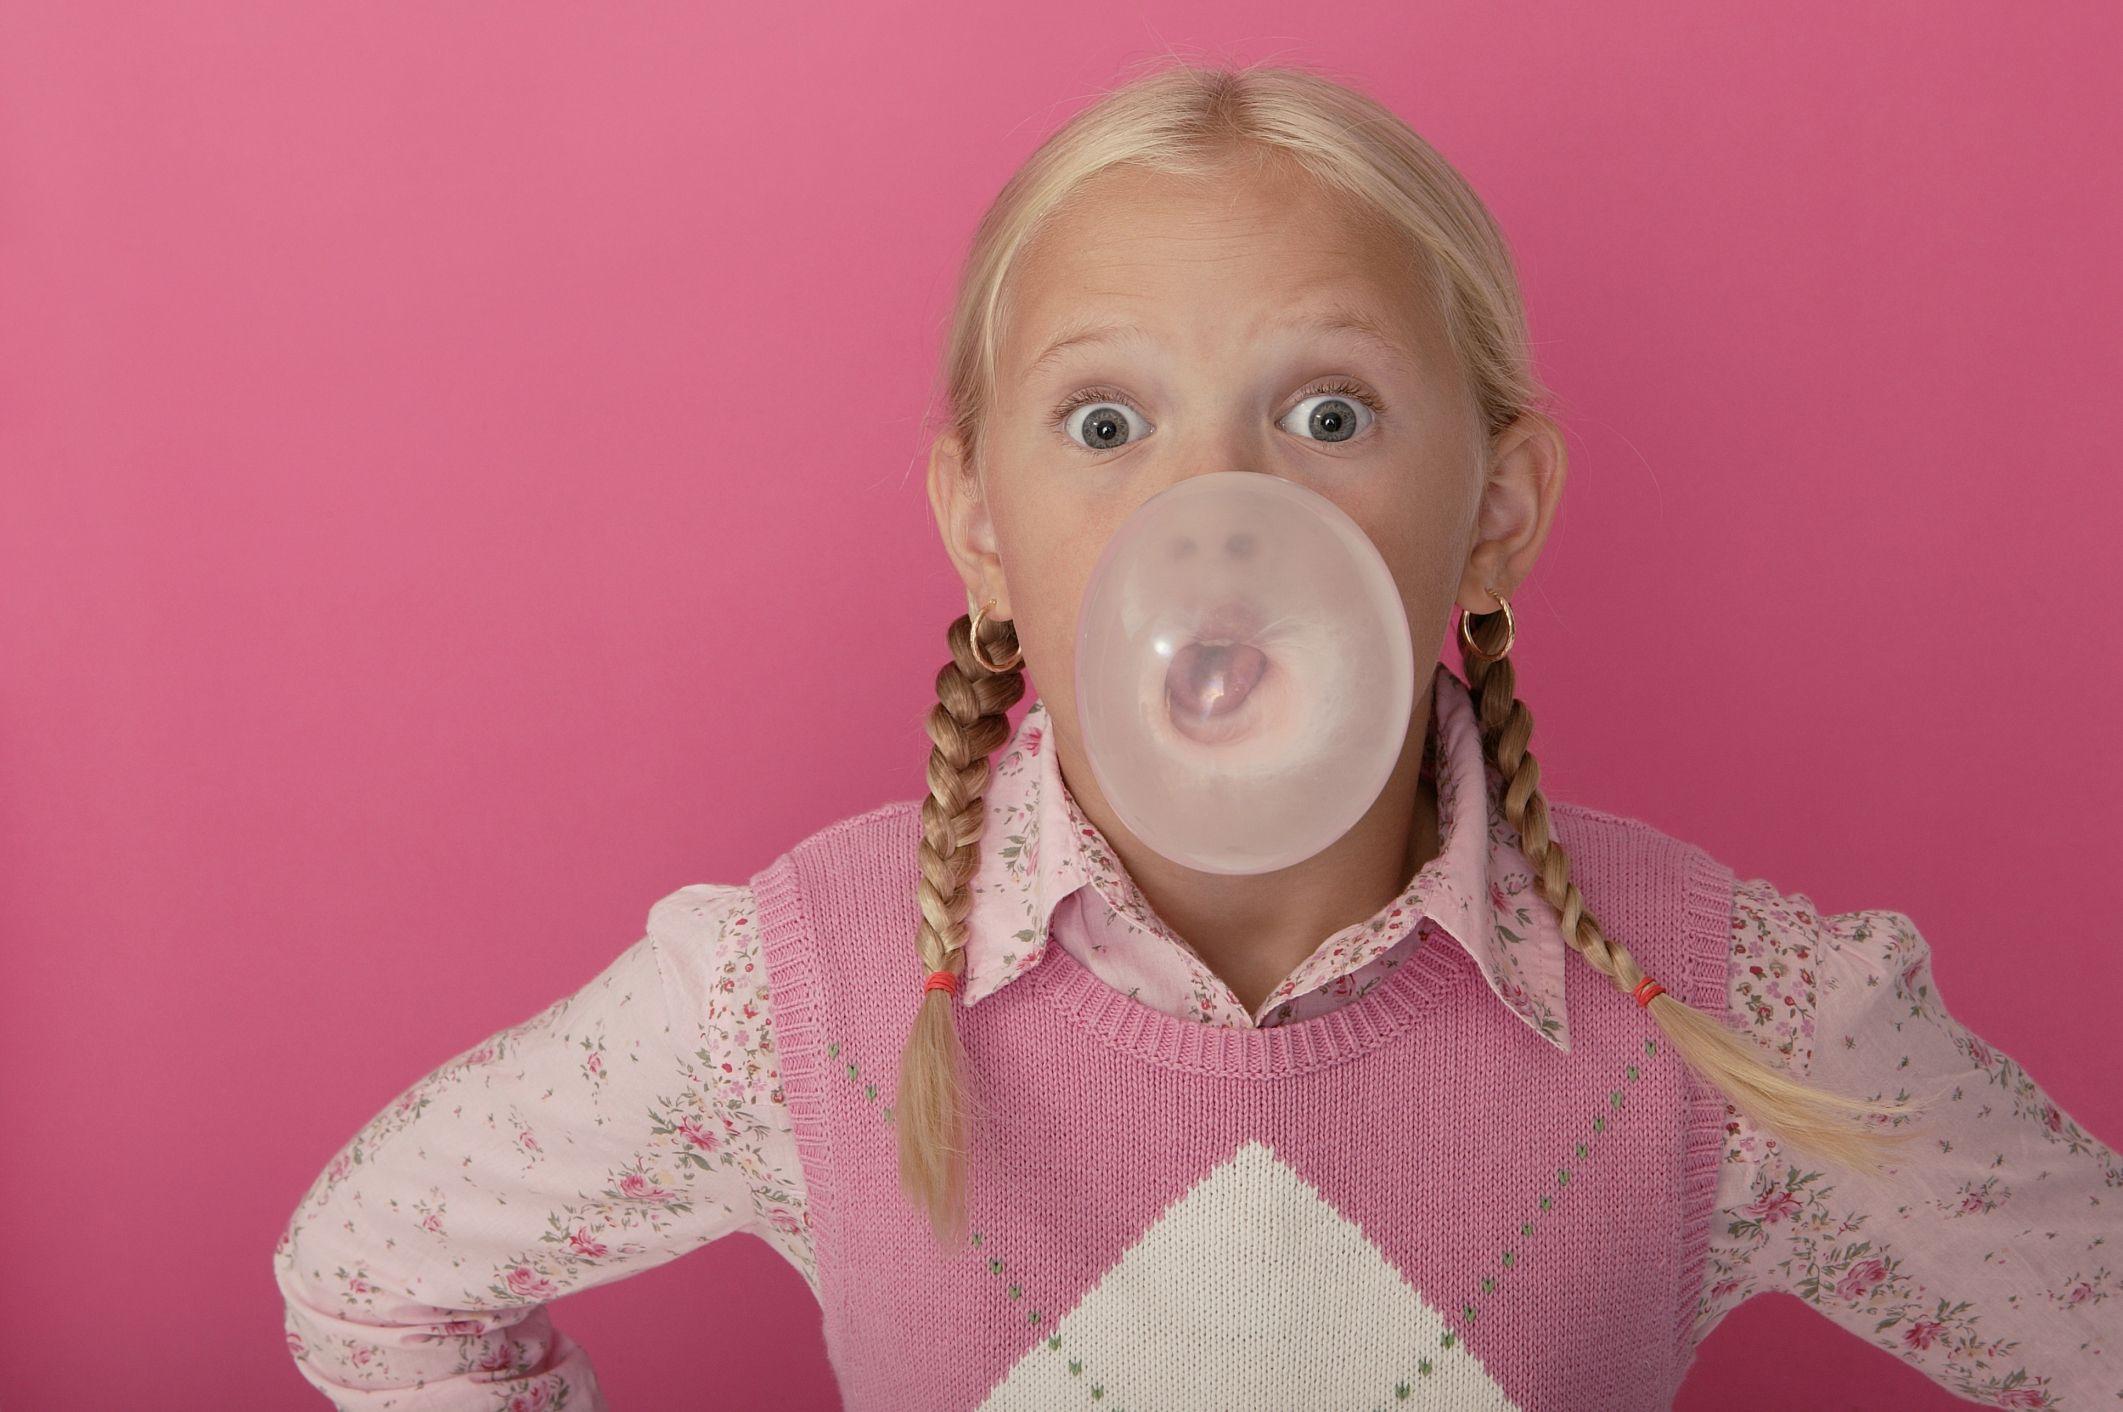 Women Blowing Bubble Gum  Bing Images